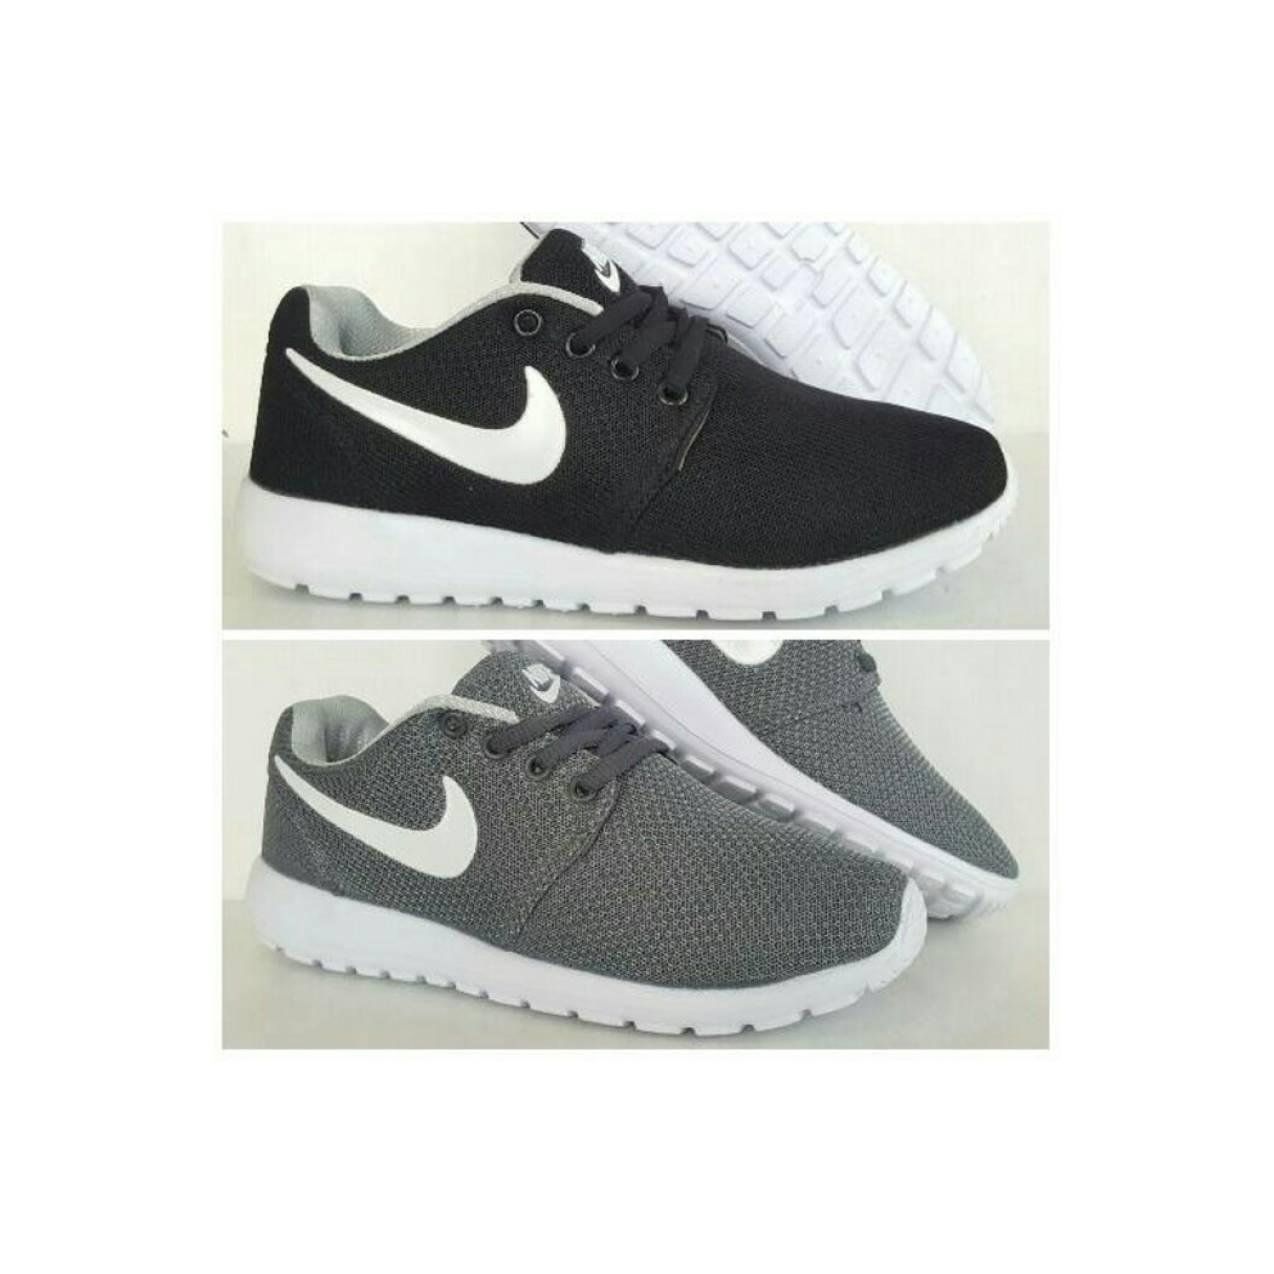 Sepatu sport nike air max free pegasus zoom running gym aerobic tenis